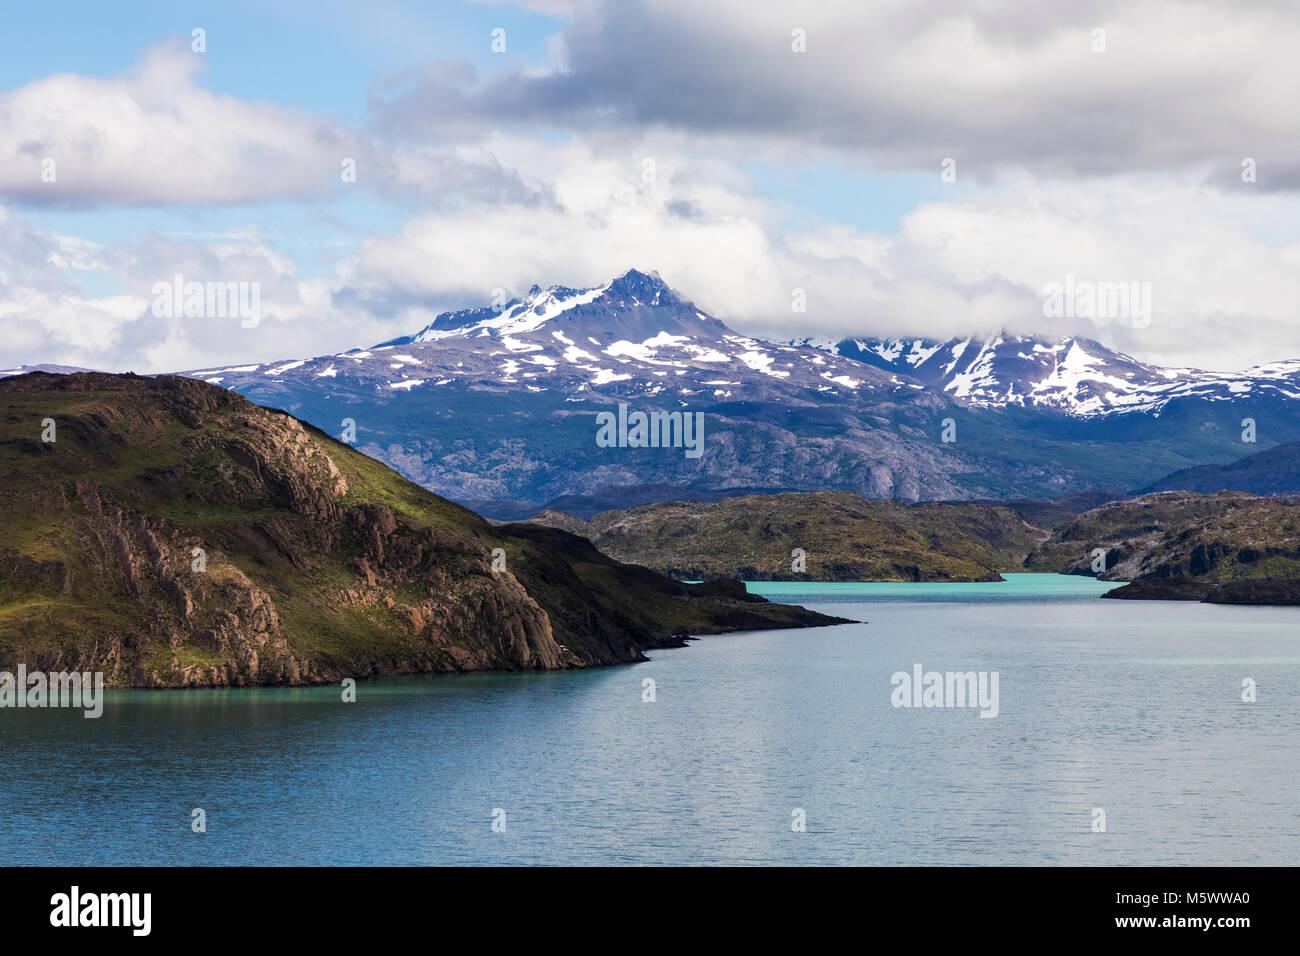 Lago Nordenskjold; Cordillera Paine beyond; Torres del Paine National Park; Chile - Stock Image